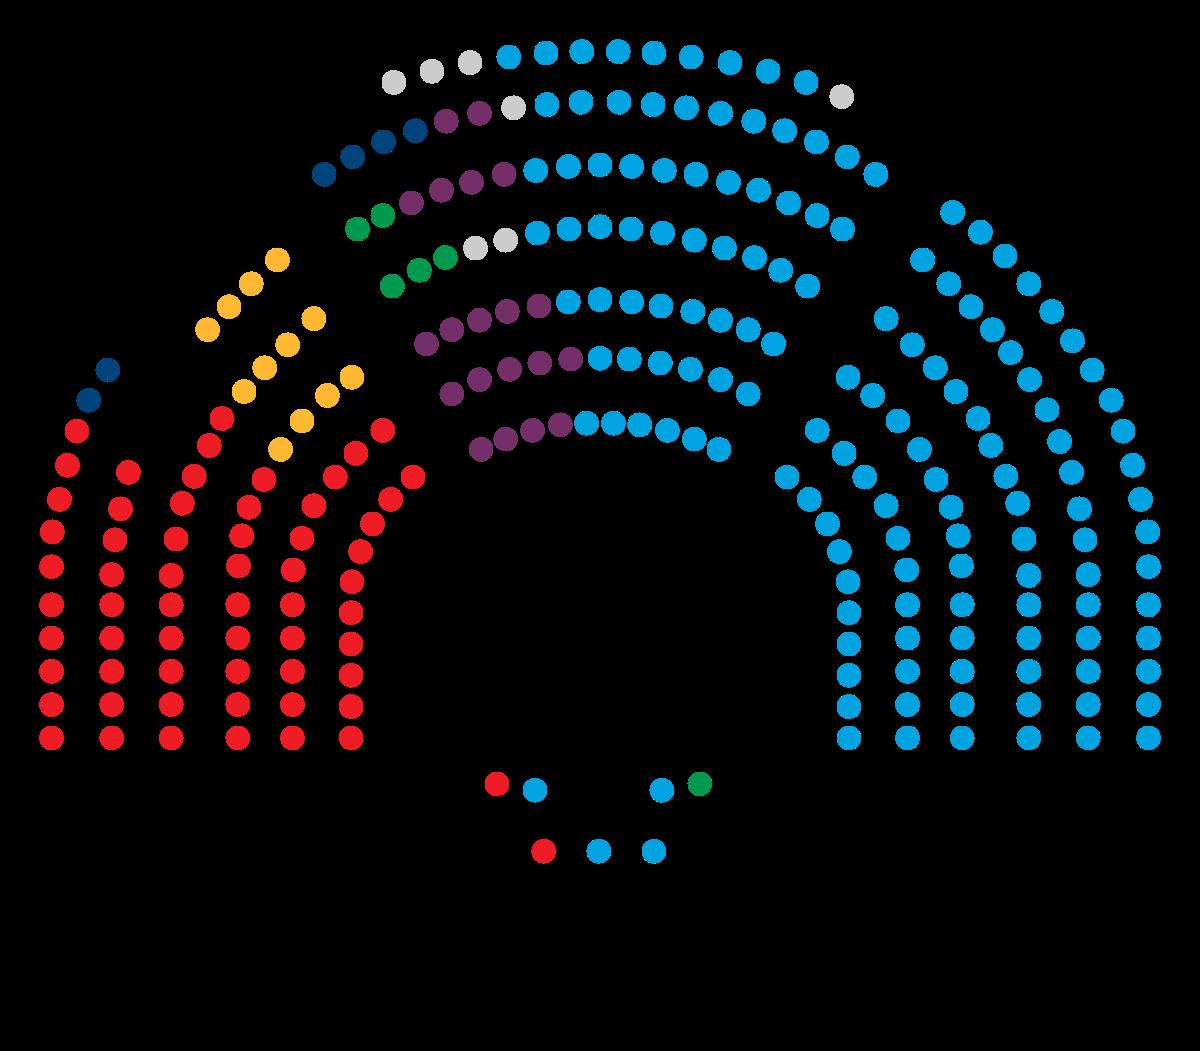 Senate house clipart image download Senate of Spain - Wikipedia image download